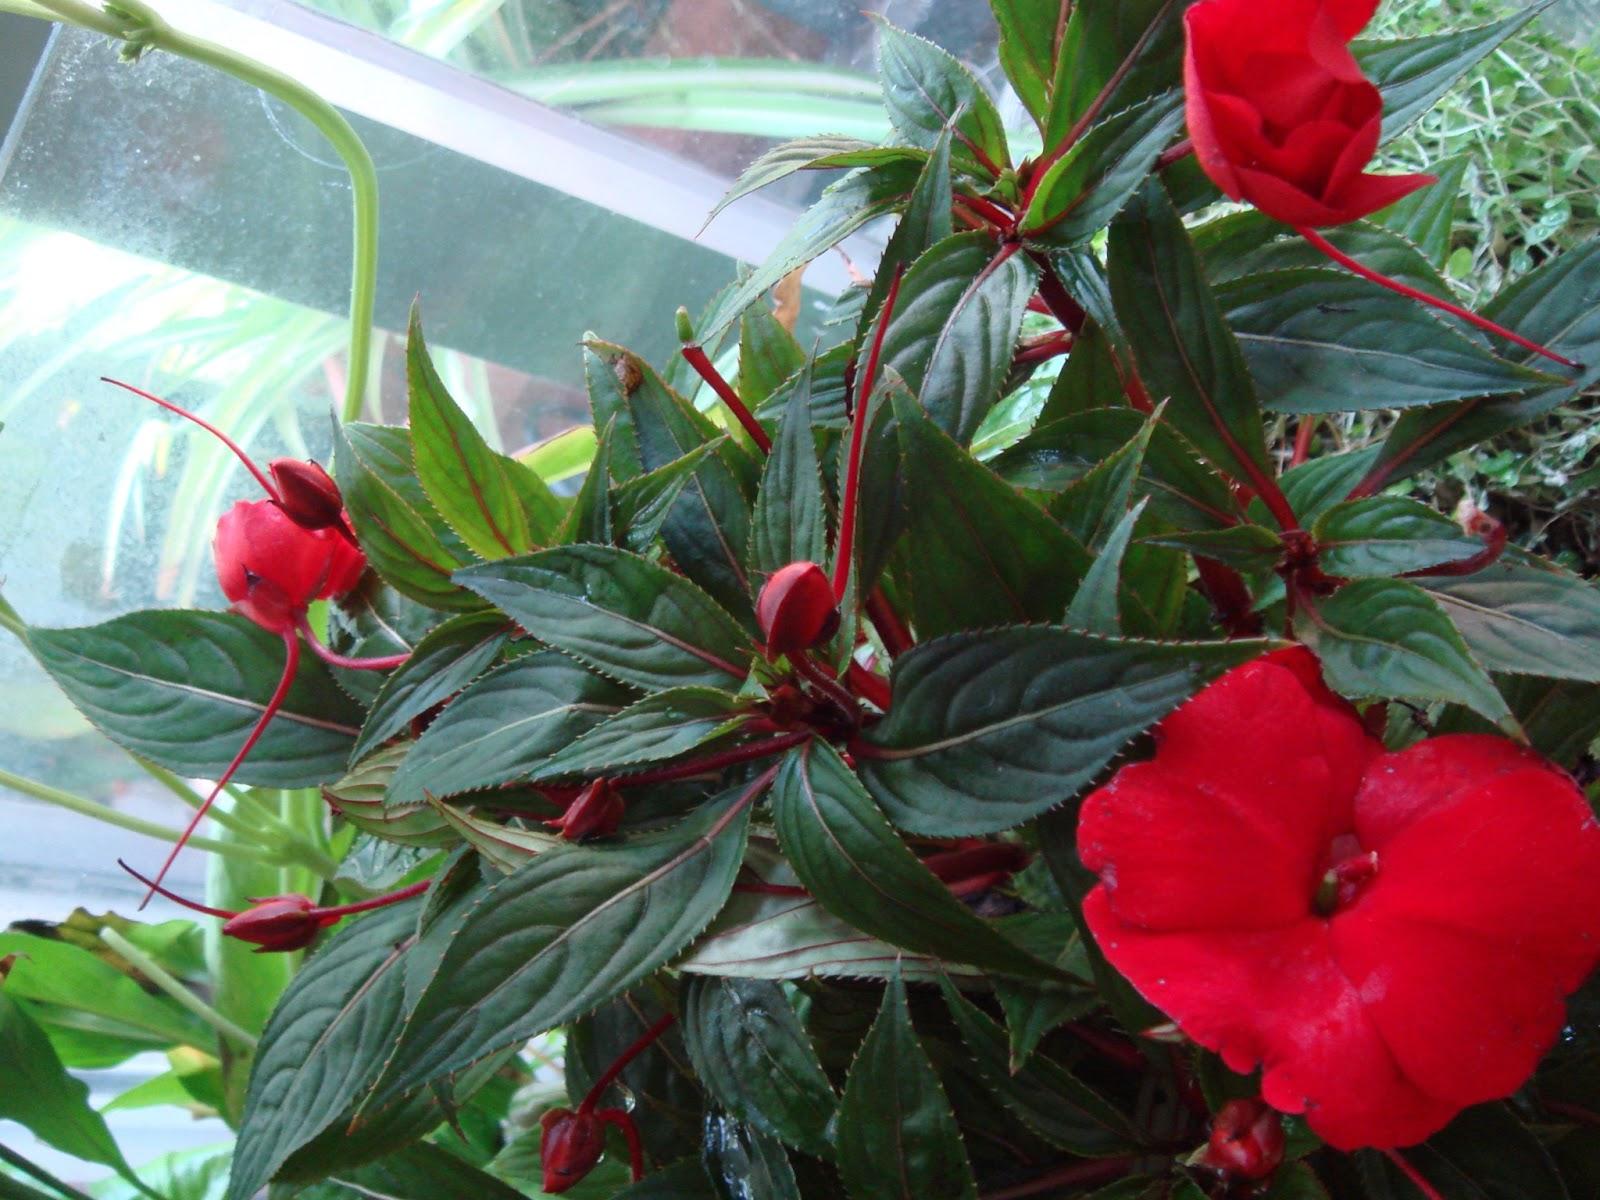 Fotografiando plantas - La casa de la alegria ...